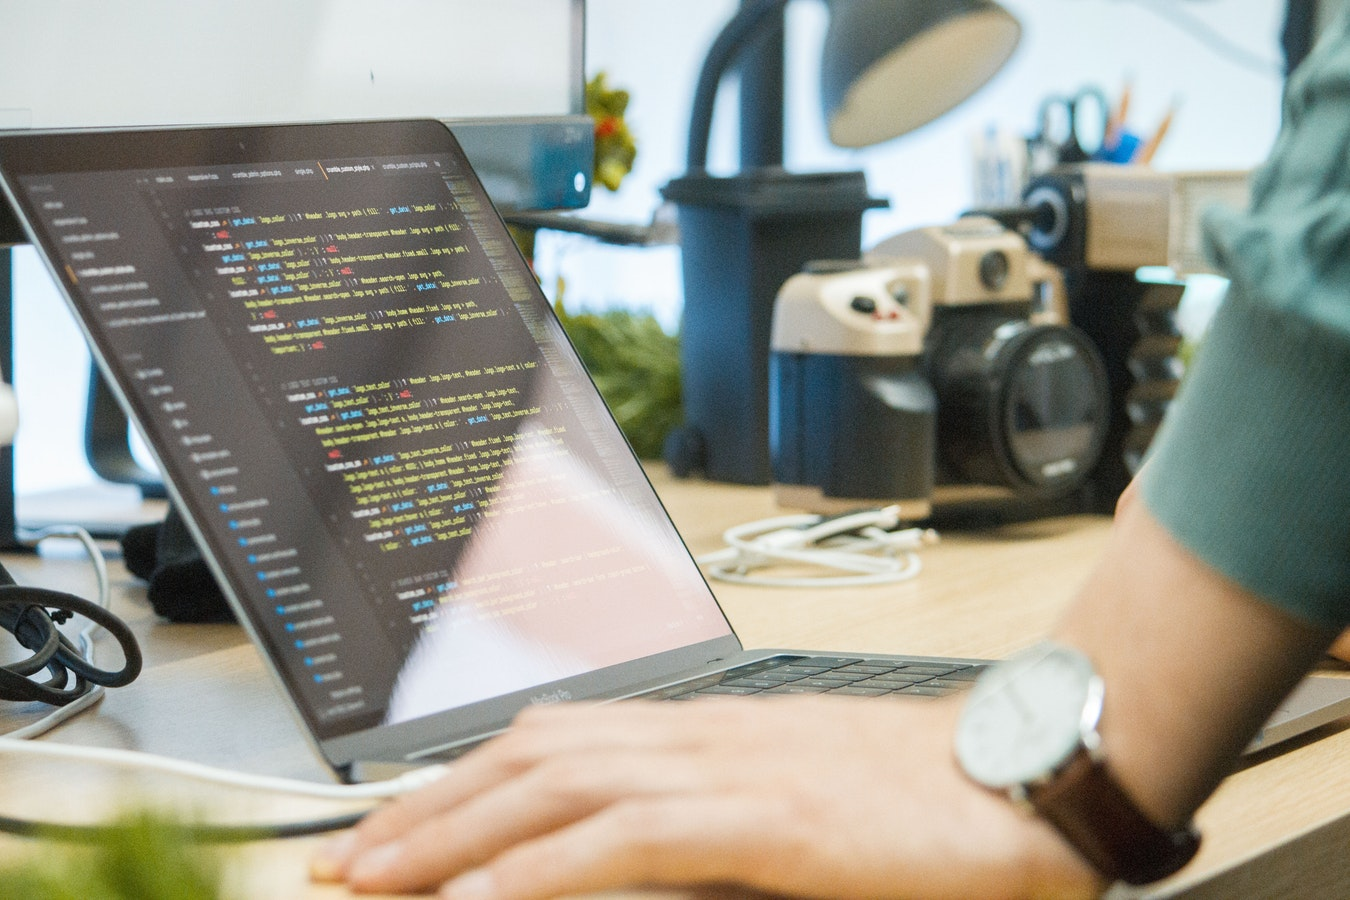 Recursos para Aprender a Programar